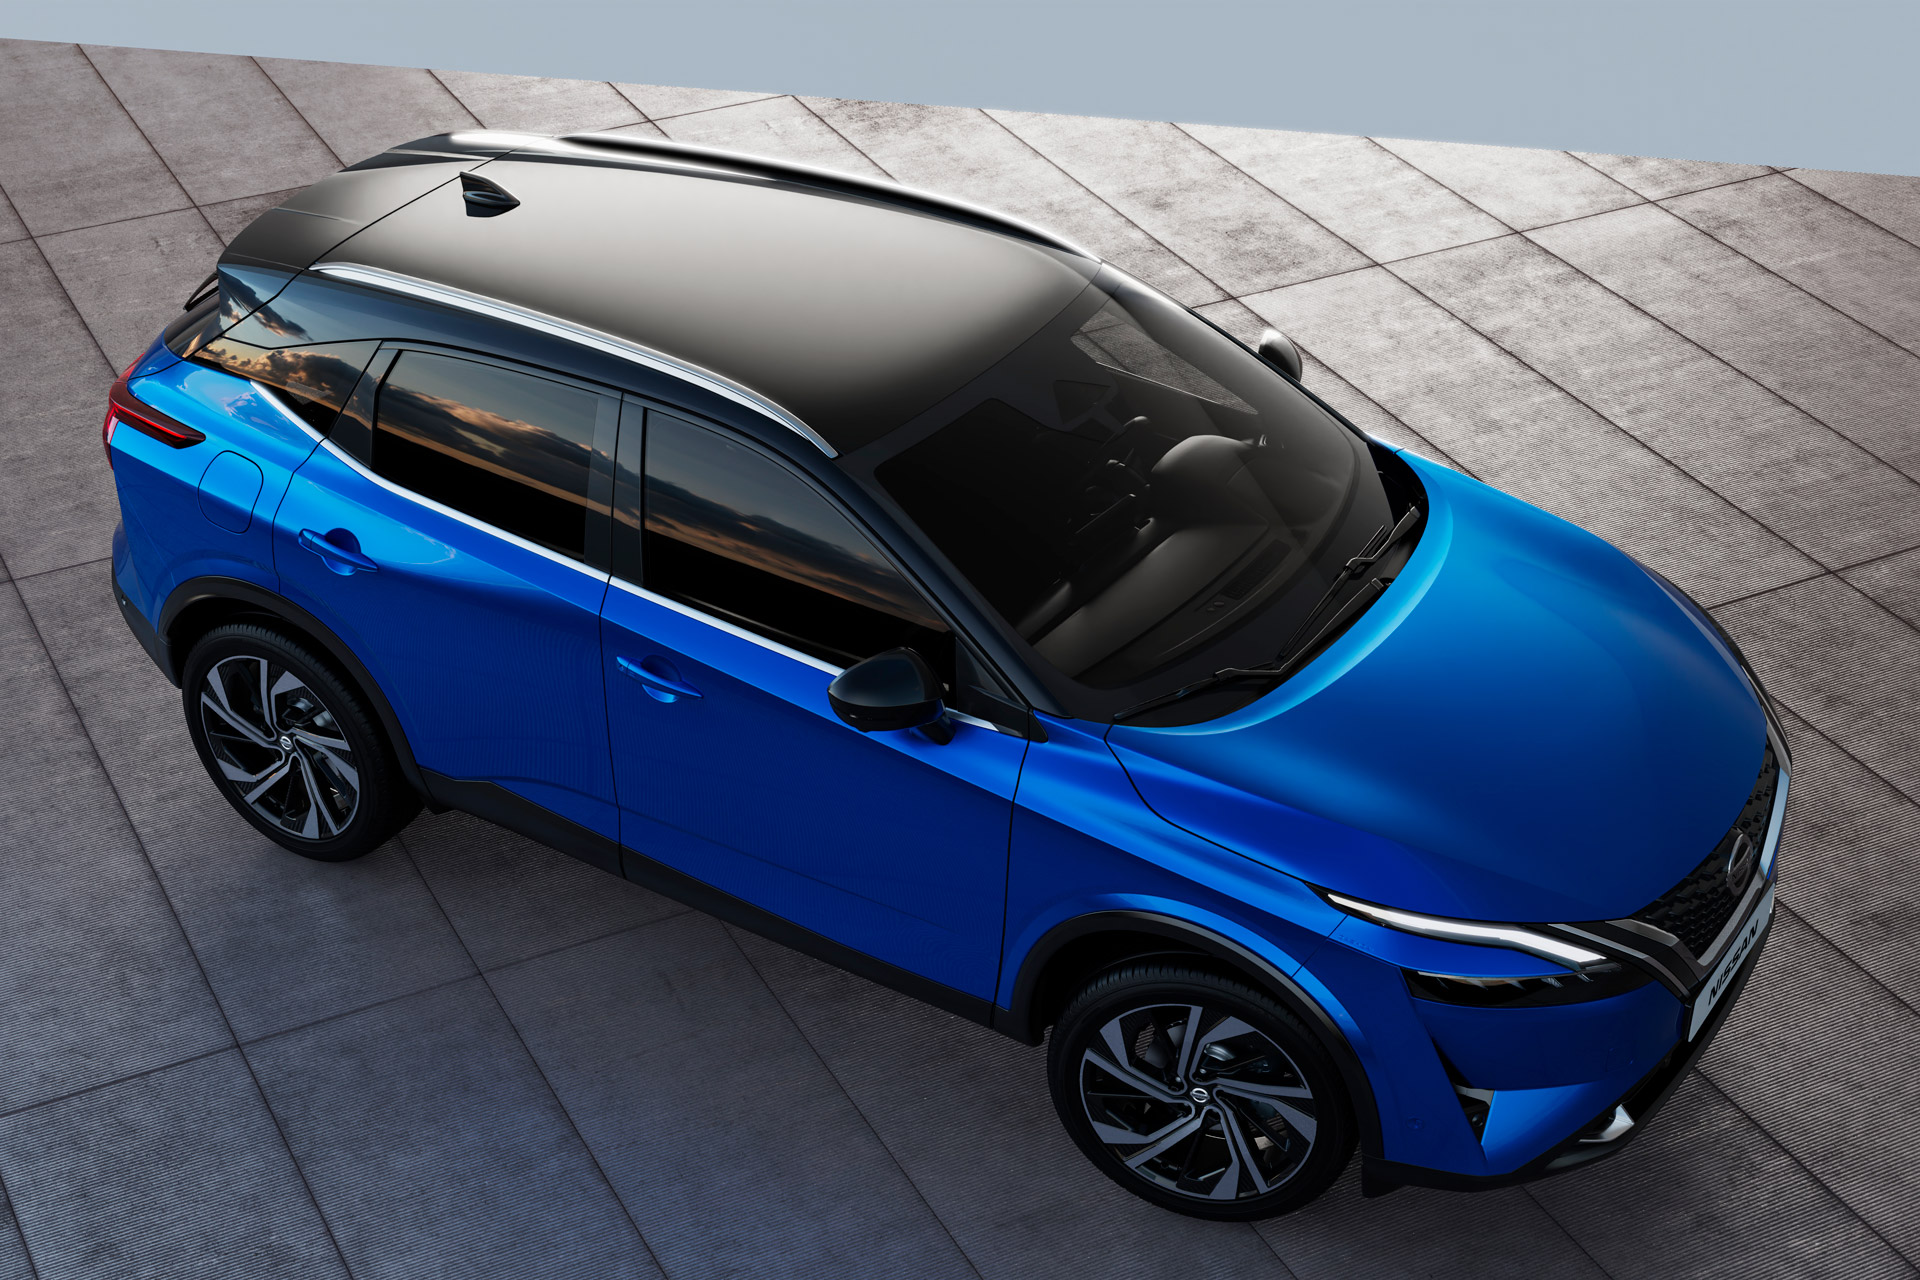 Nissan Qashqai 2021 set fra oven